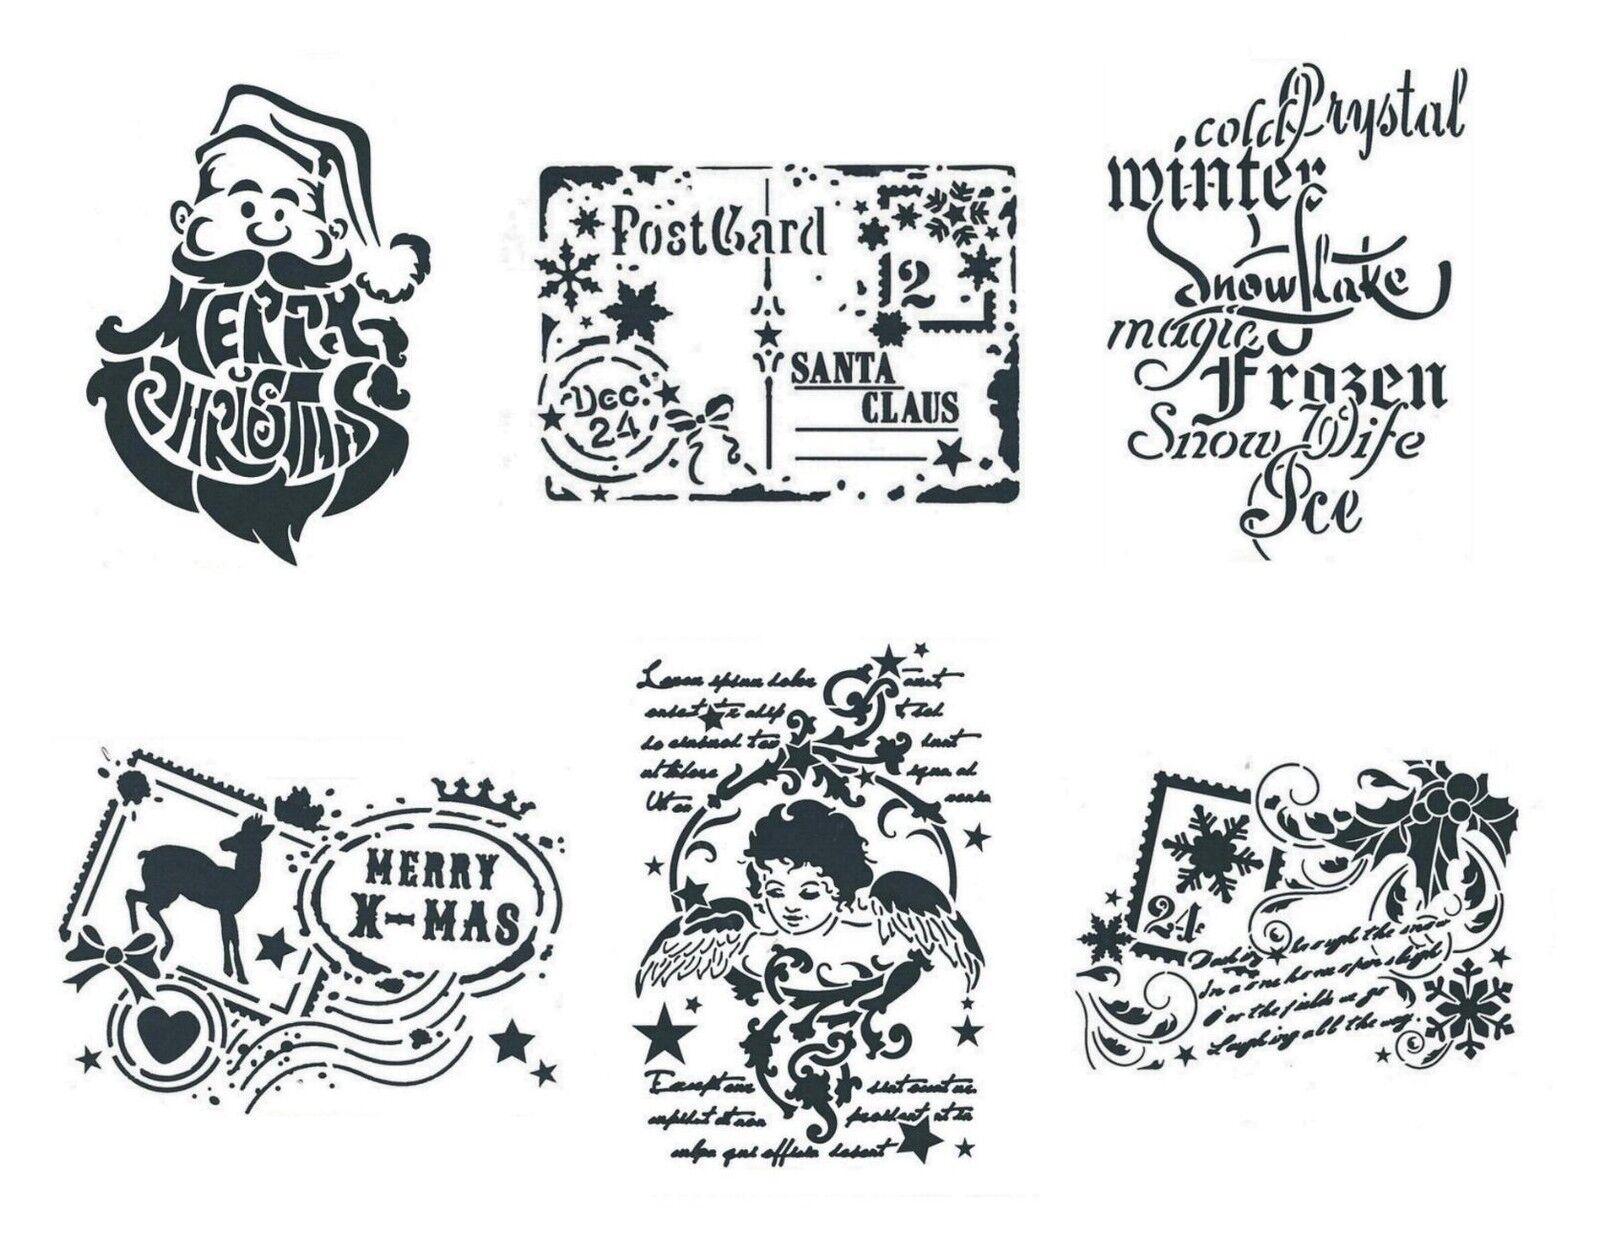 a4 a5 schablone heike sch fer fashion textil stencil. Black Bedroom Furniture Sets. Home Design Ideas